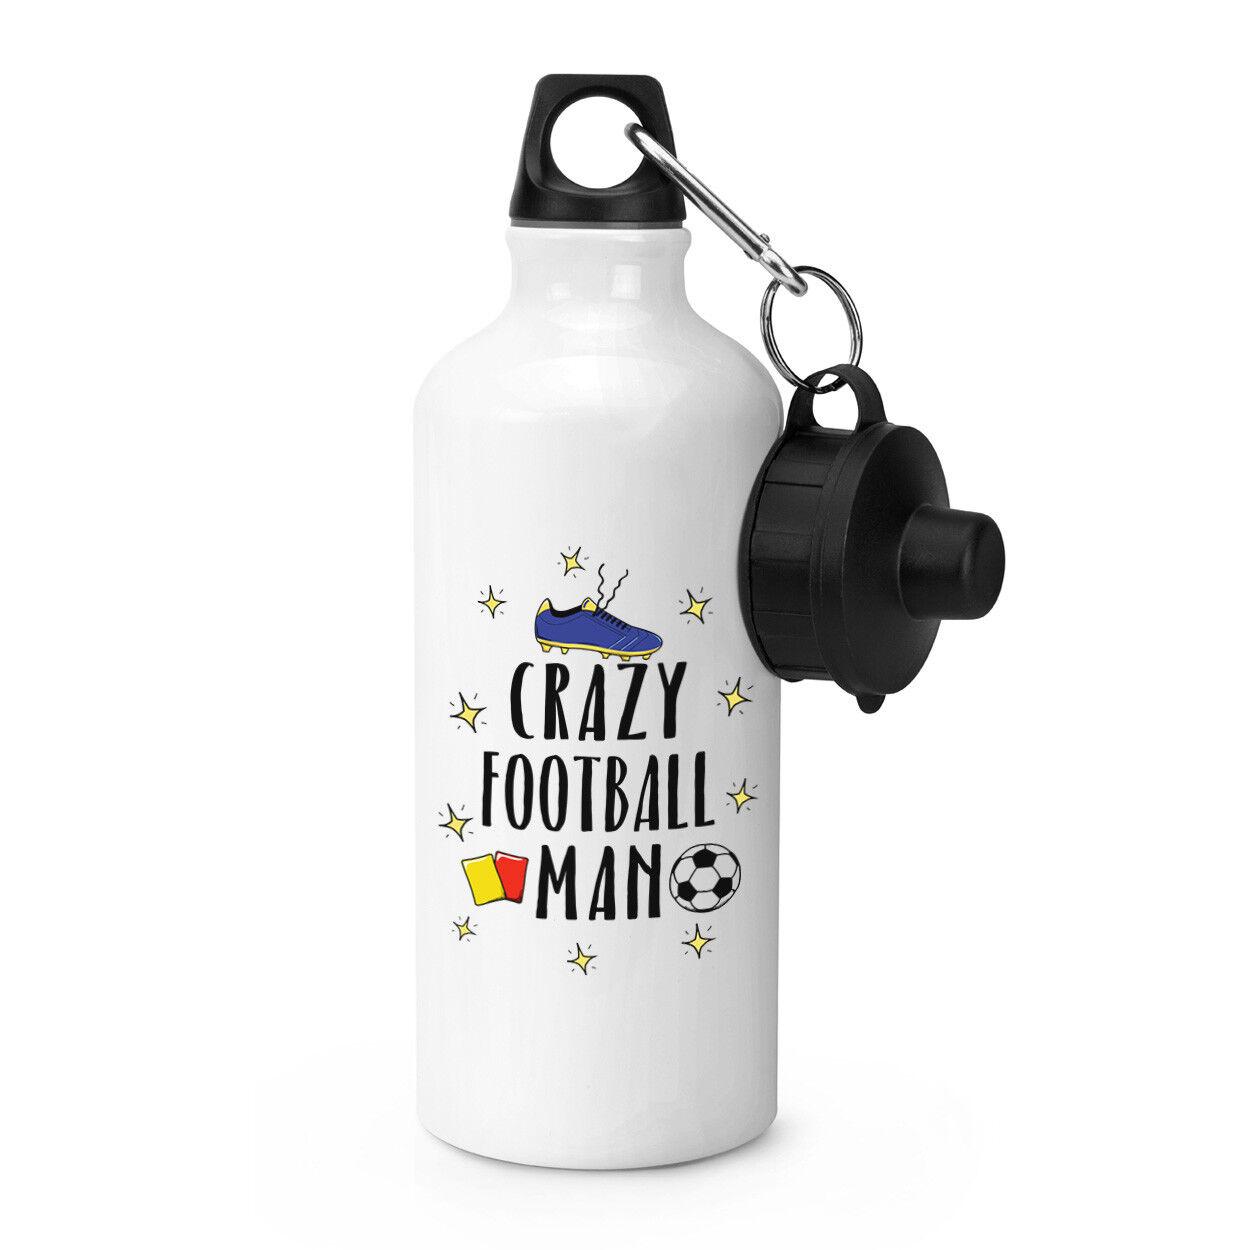 Crazy Crazy Crazy Football Homme Sports Boisson Bouteille Camping fiole-Drôle de soccer 7bbc33